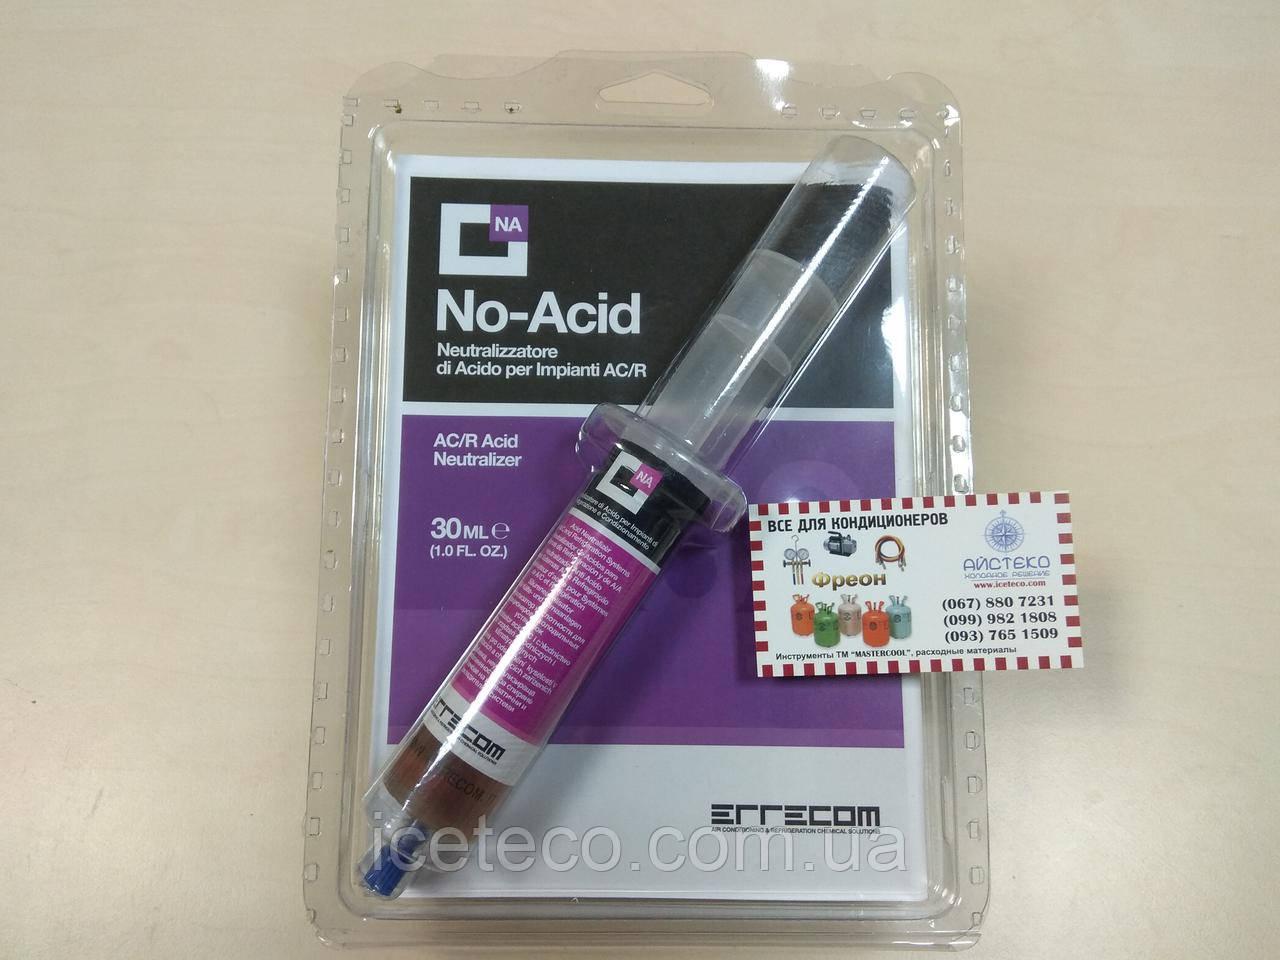 Нейтралізатор кислотності (30 мл) No-Acid TR1124.C.J9 Errecom